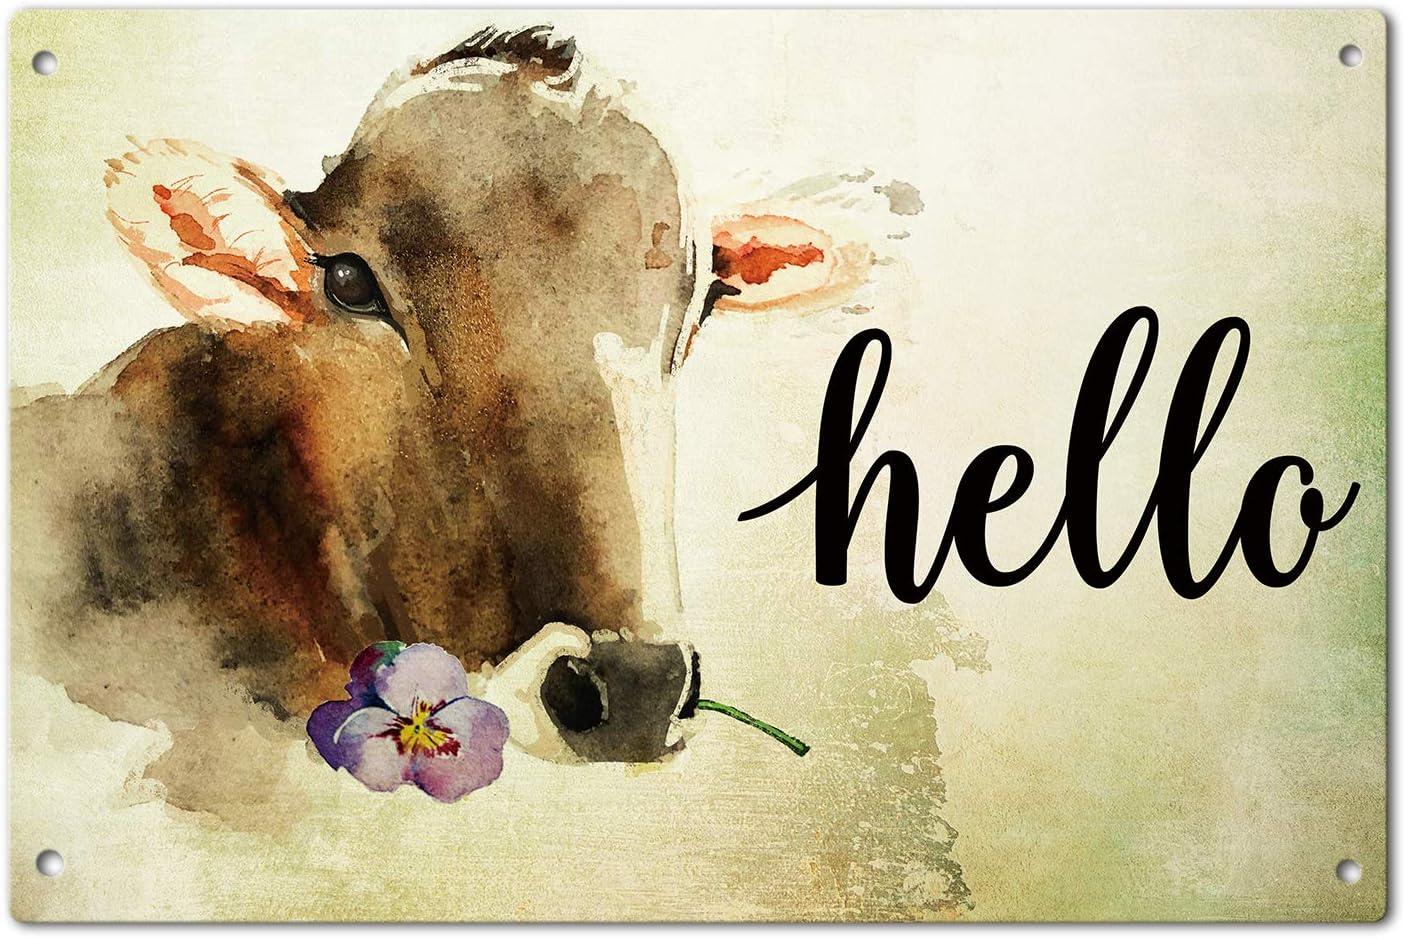 Agantree Art Hello Farm House Cow Cattle Garden Yard Porch Metal Sign Outdoor Decorative Metal Plaque 12 x 8 Inch